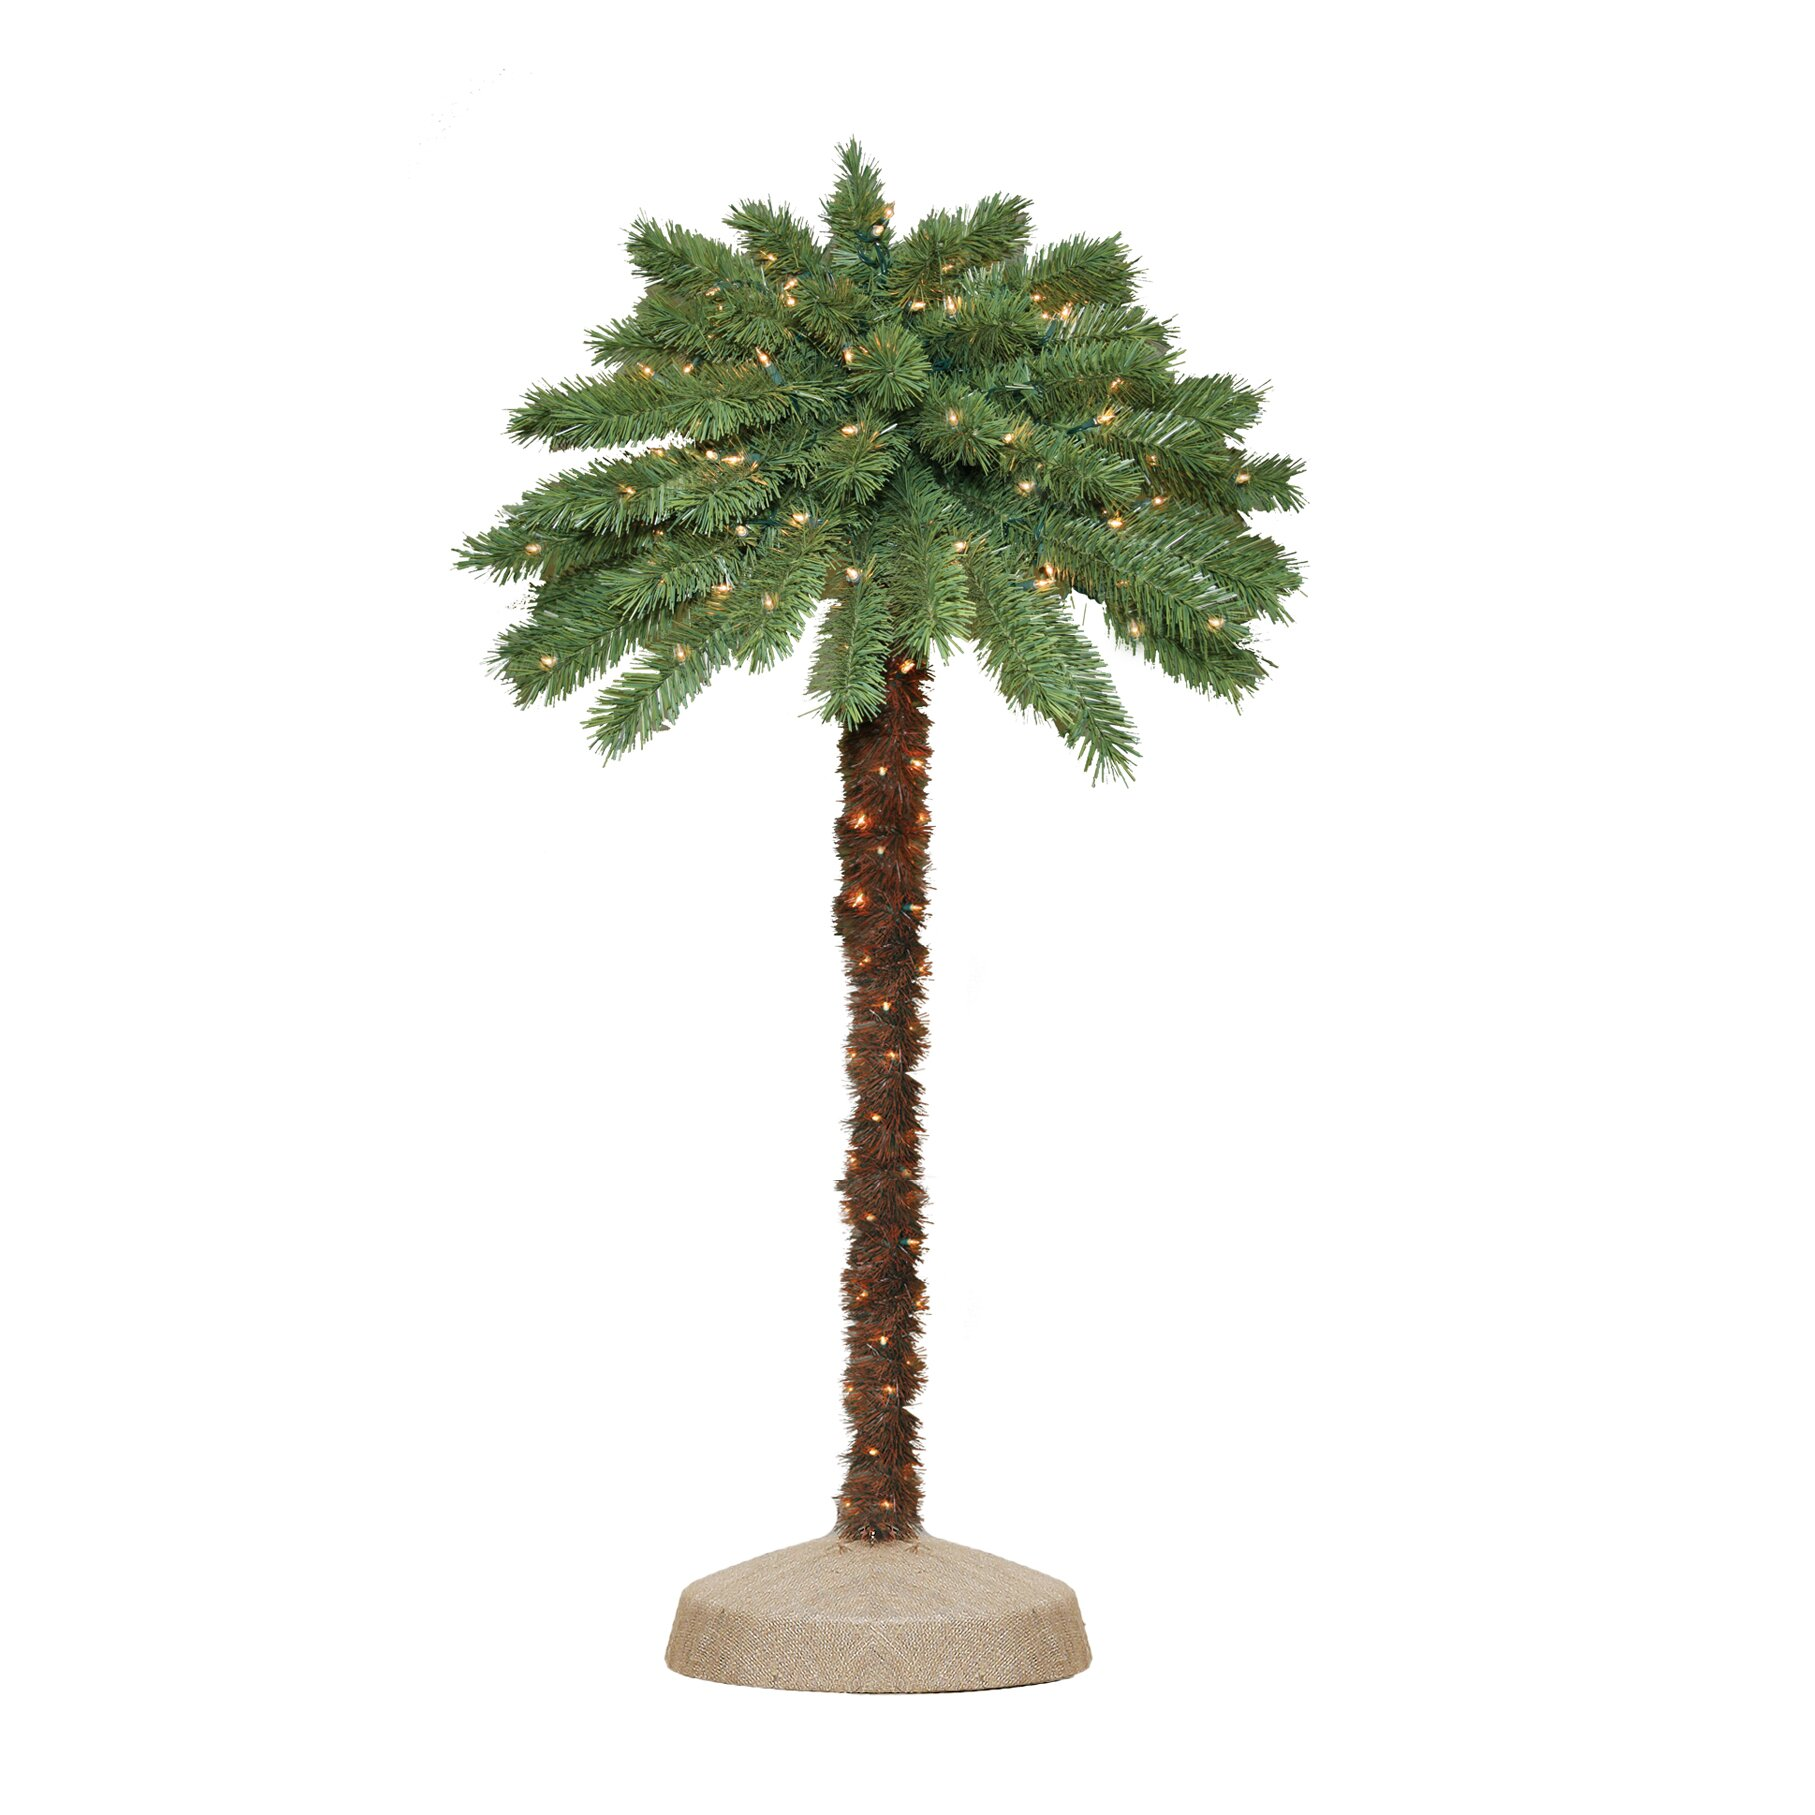 Christmas Lights Palm Trees: General Foam Plastics 4' Green Tropical Artificial